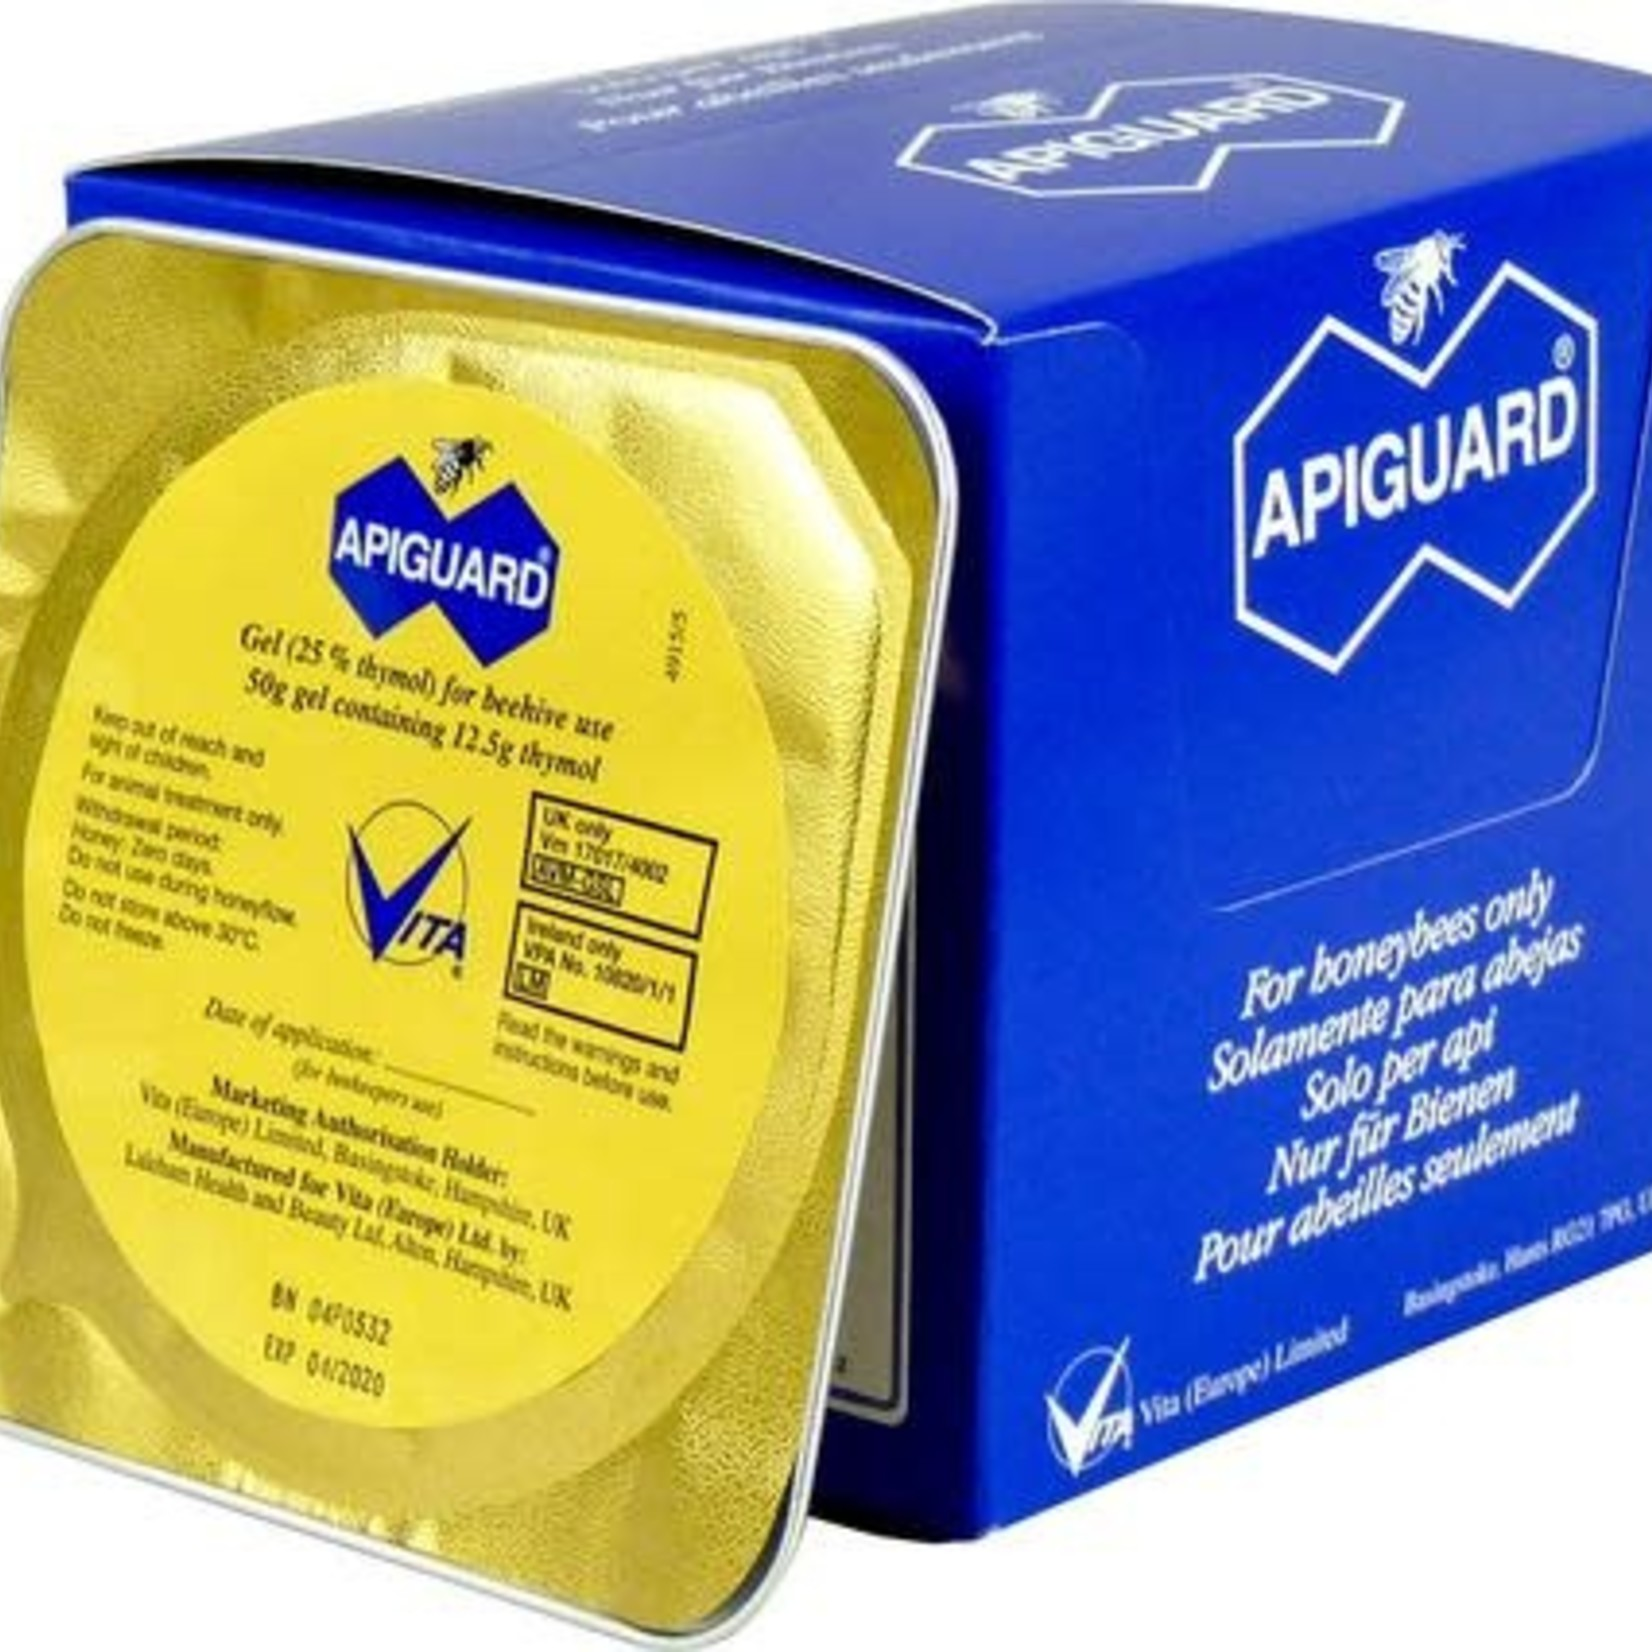 Apiguard - (Bee Keeping Equipment)